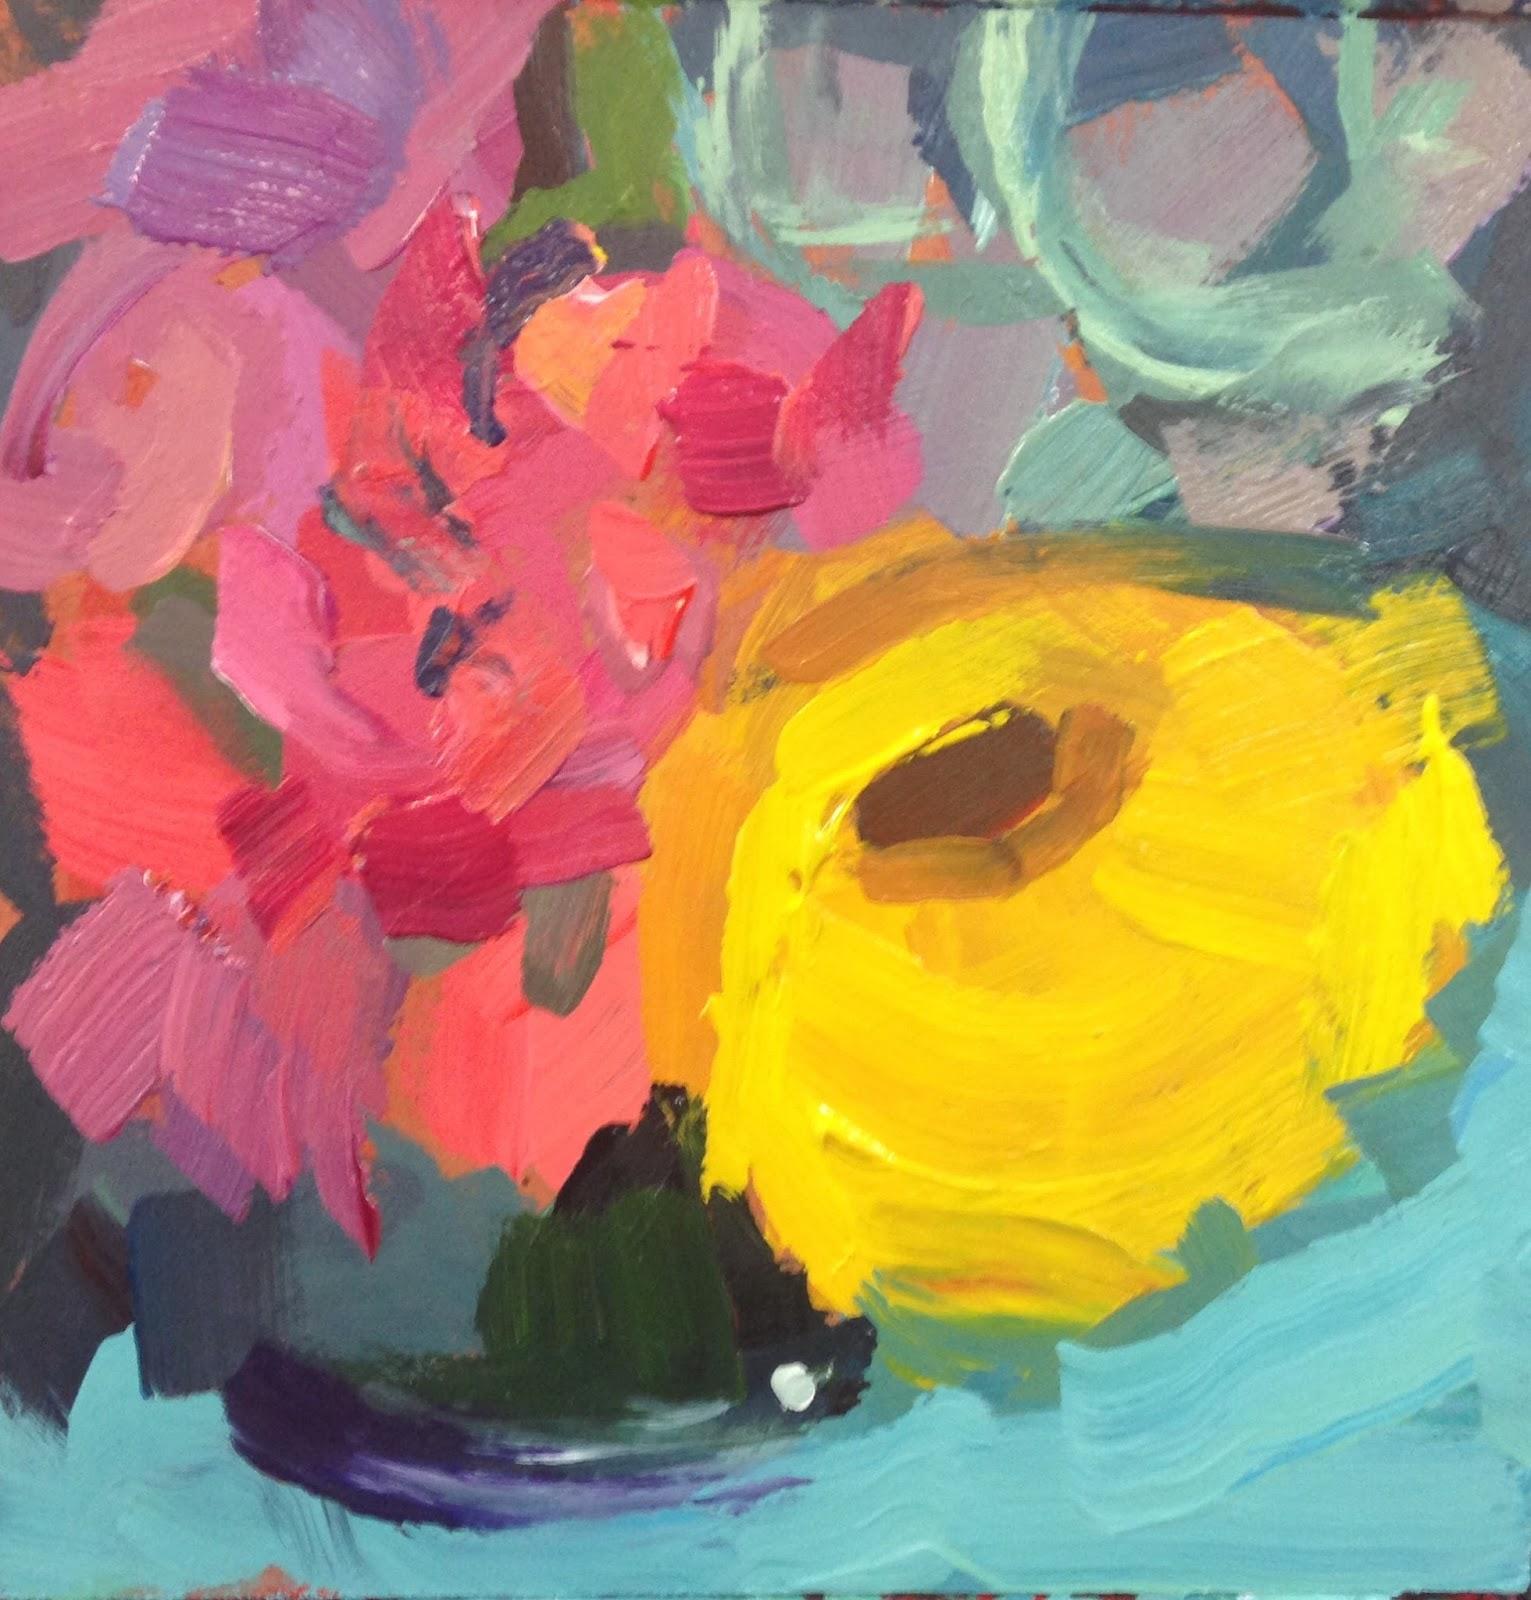 Lisa Darias Painting A Day 3144 Bonita Springs